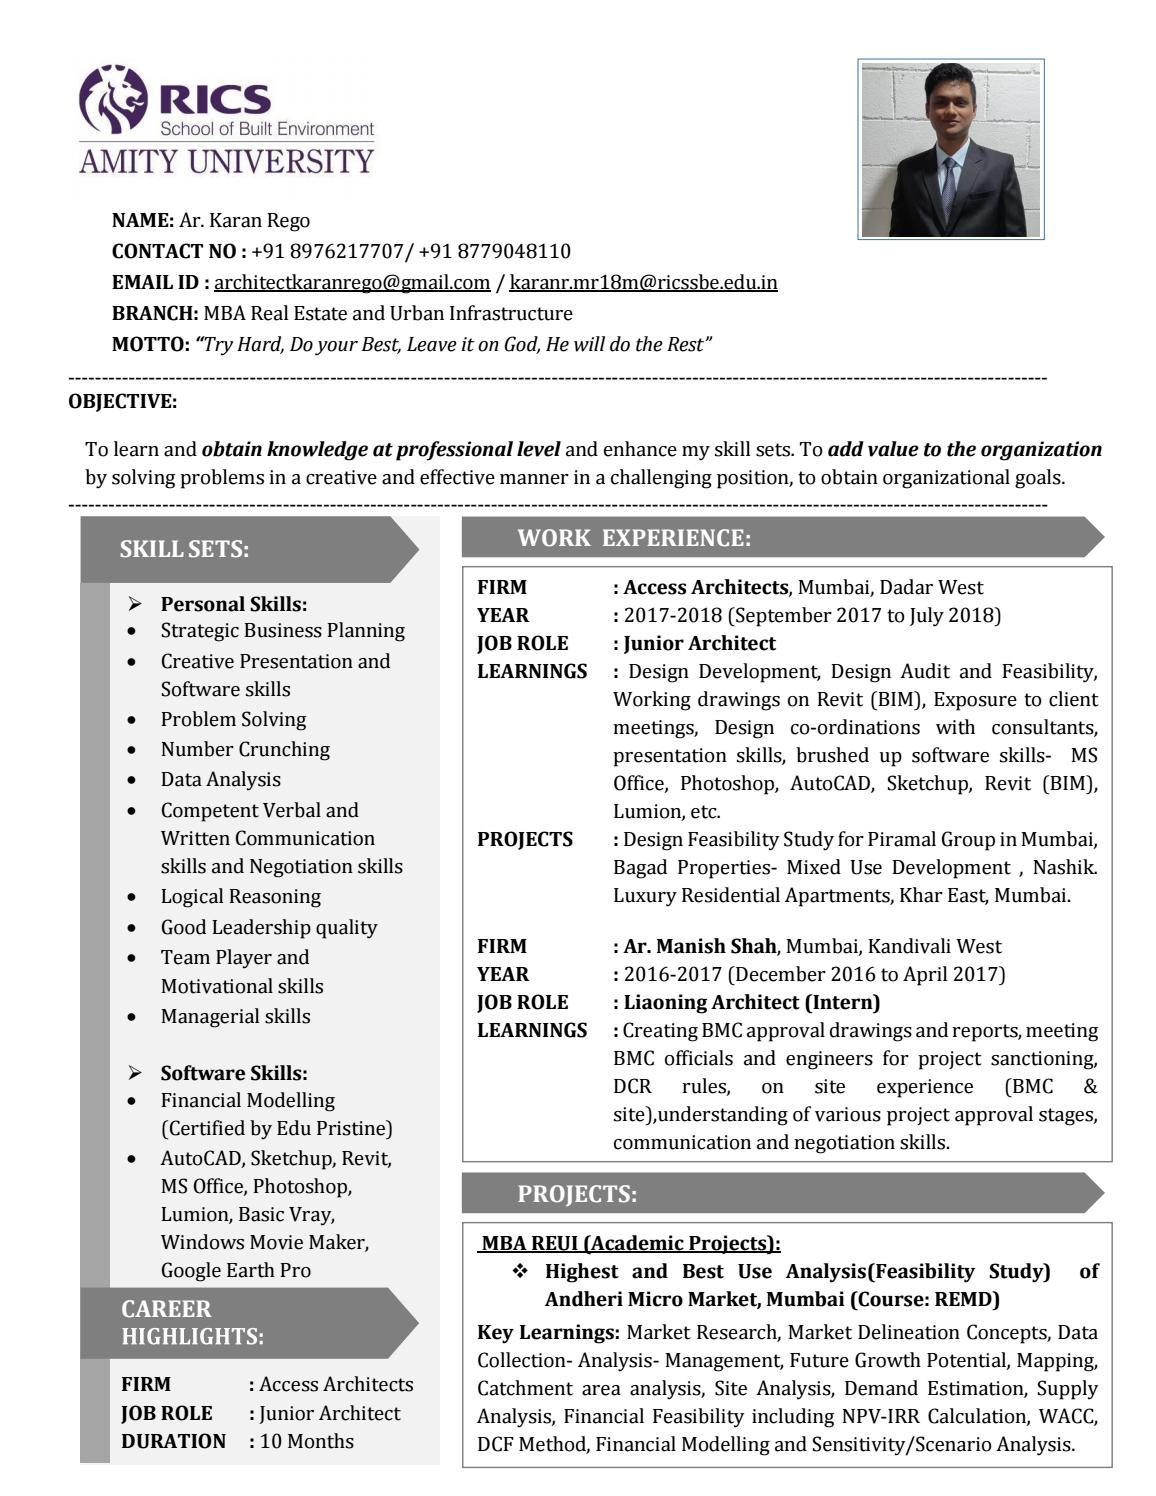 Resume Rules 2017.Job Resume Ar Karan Rego Mba Reui Rics Sbe Amity